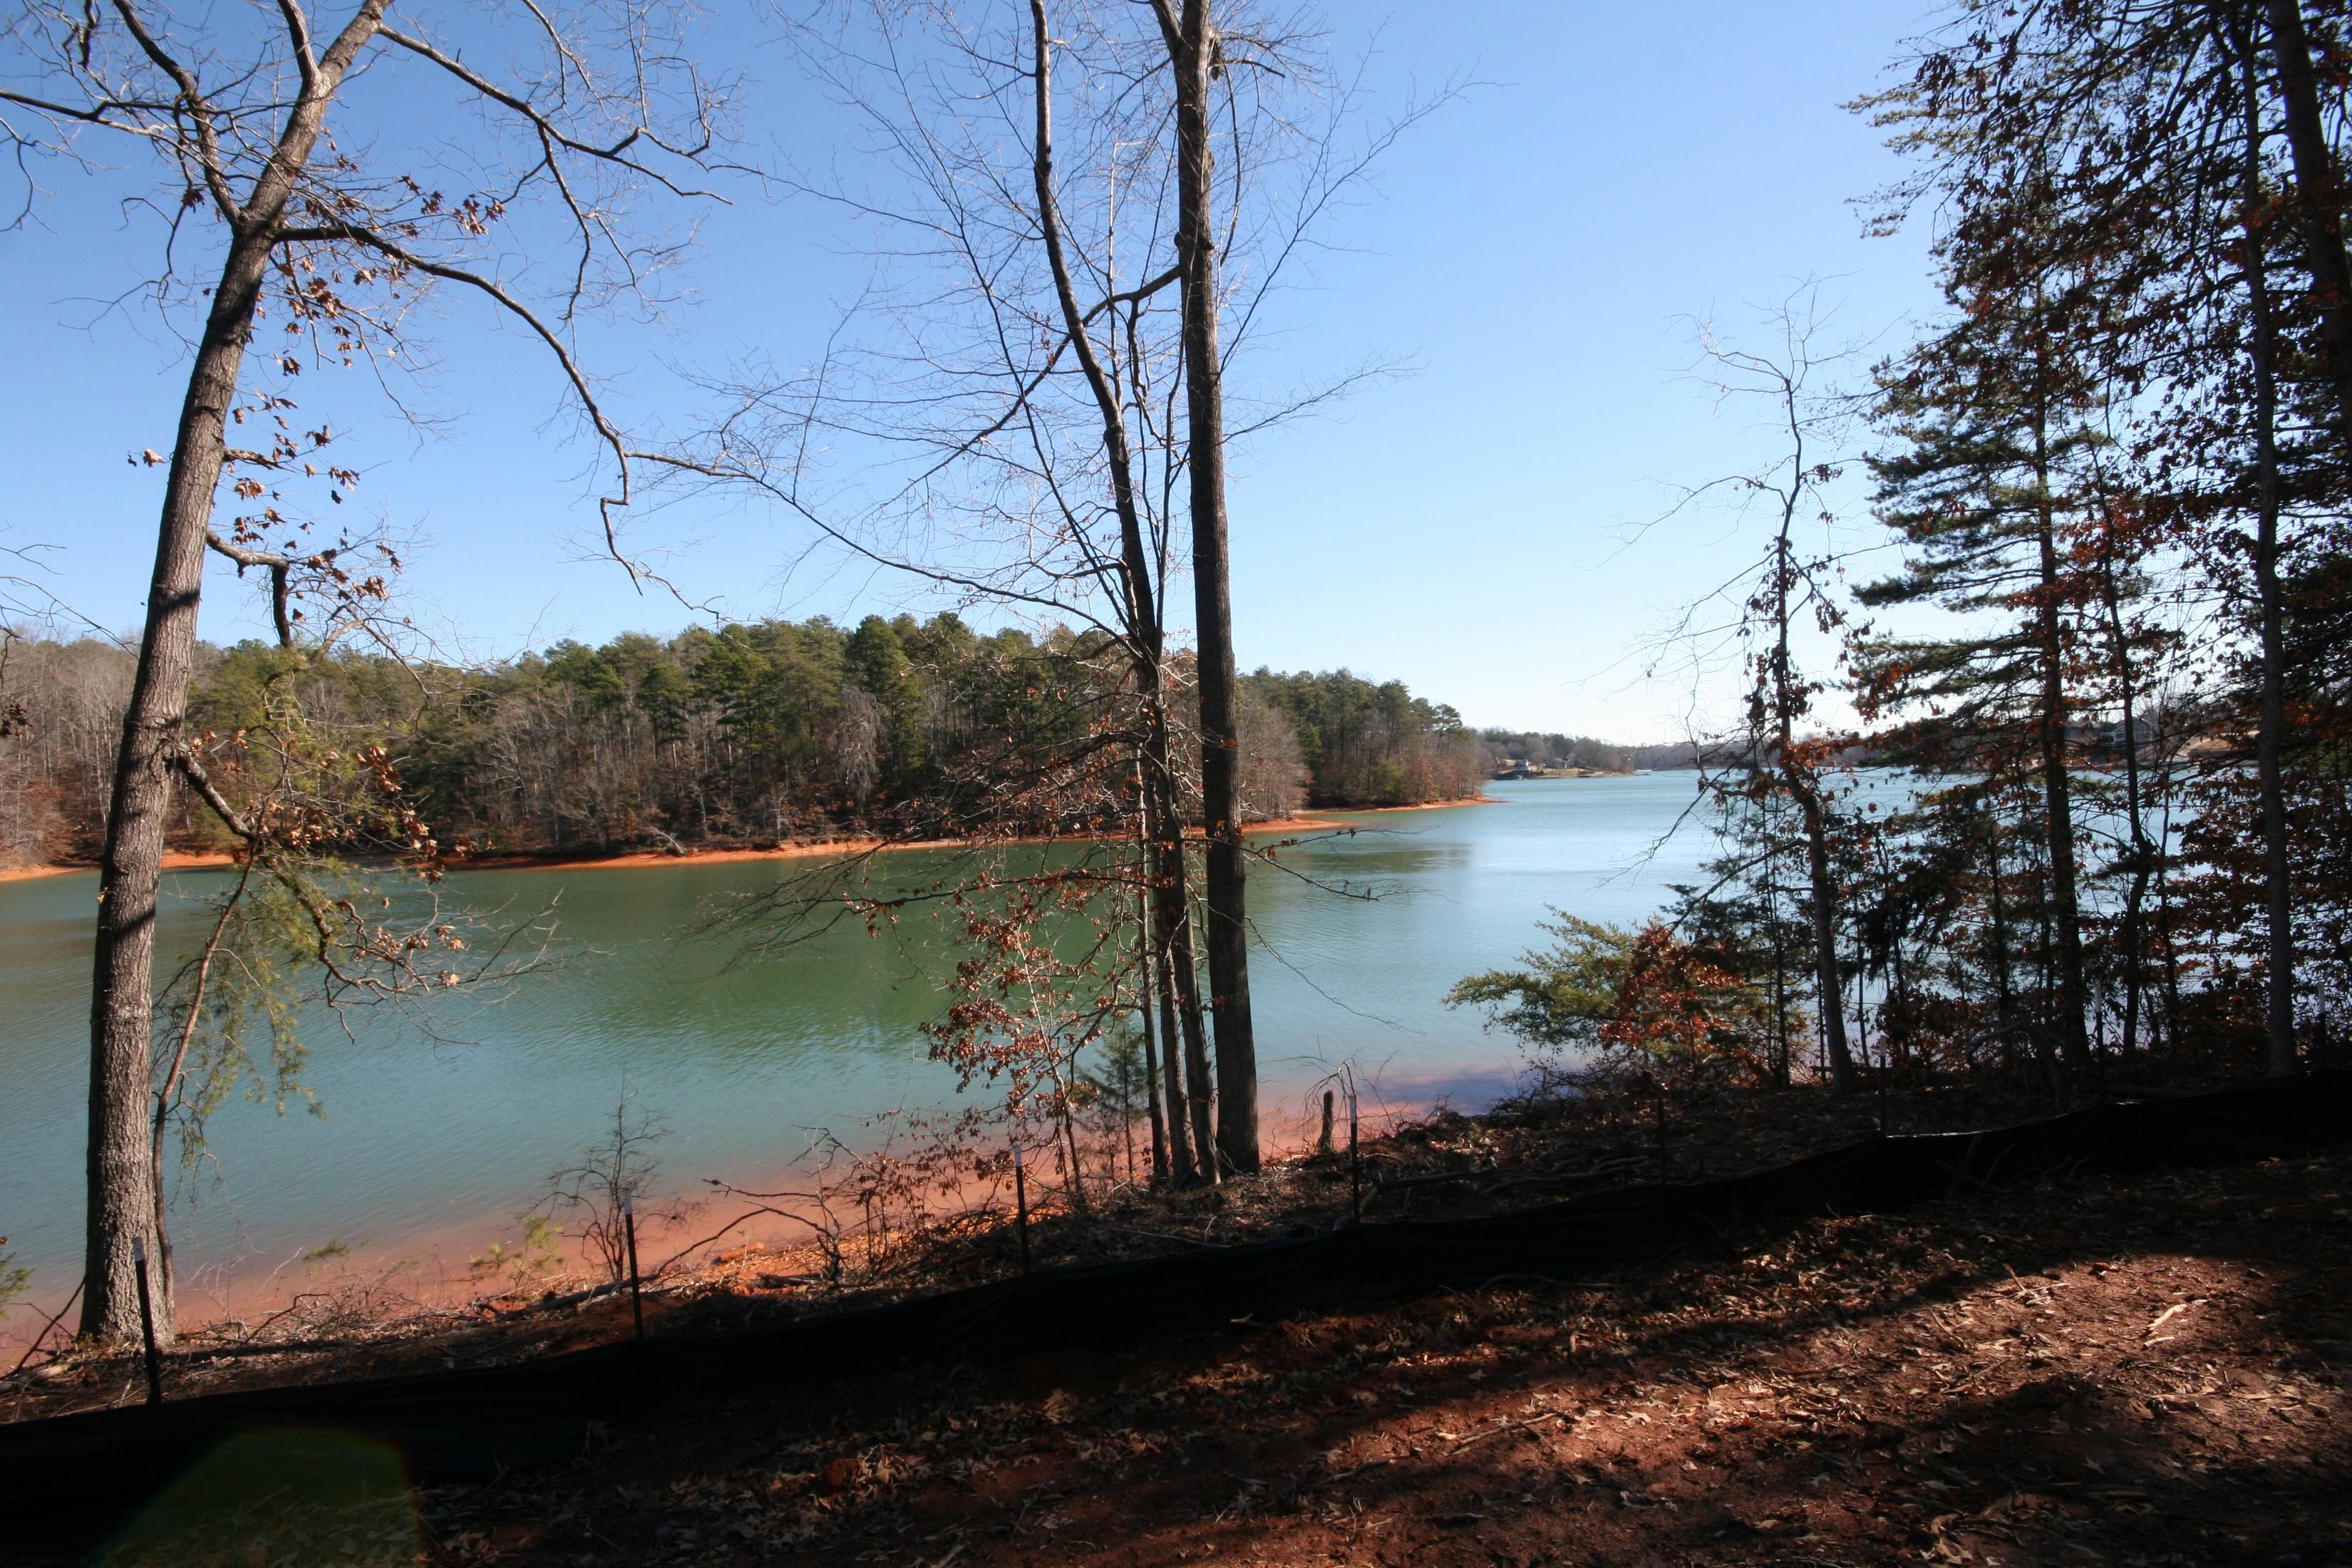 Land for Sale at Gradual Slope to Shoreline on Beautiful Lake Keowee Lot 25 Peninsula Pointe North West Union, South Carolina, 29696 United States